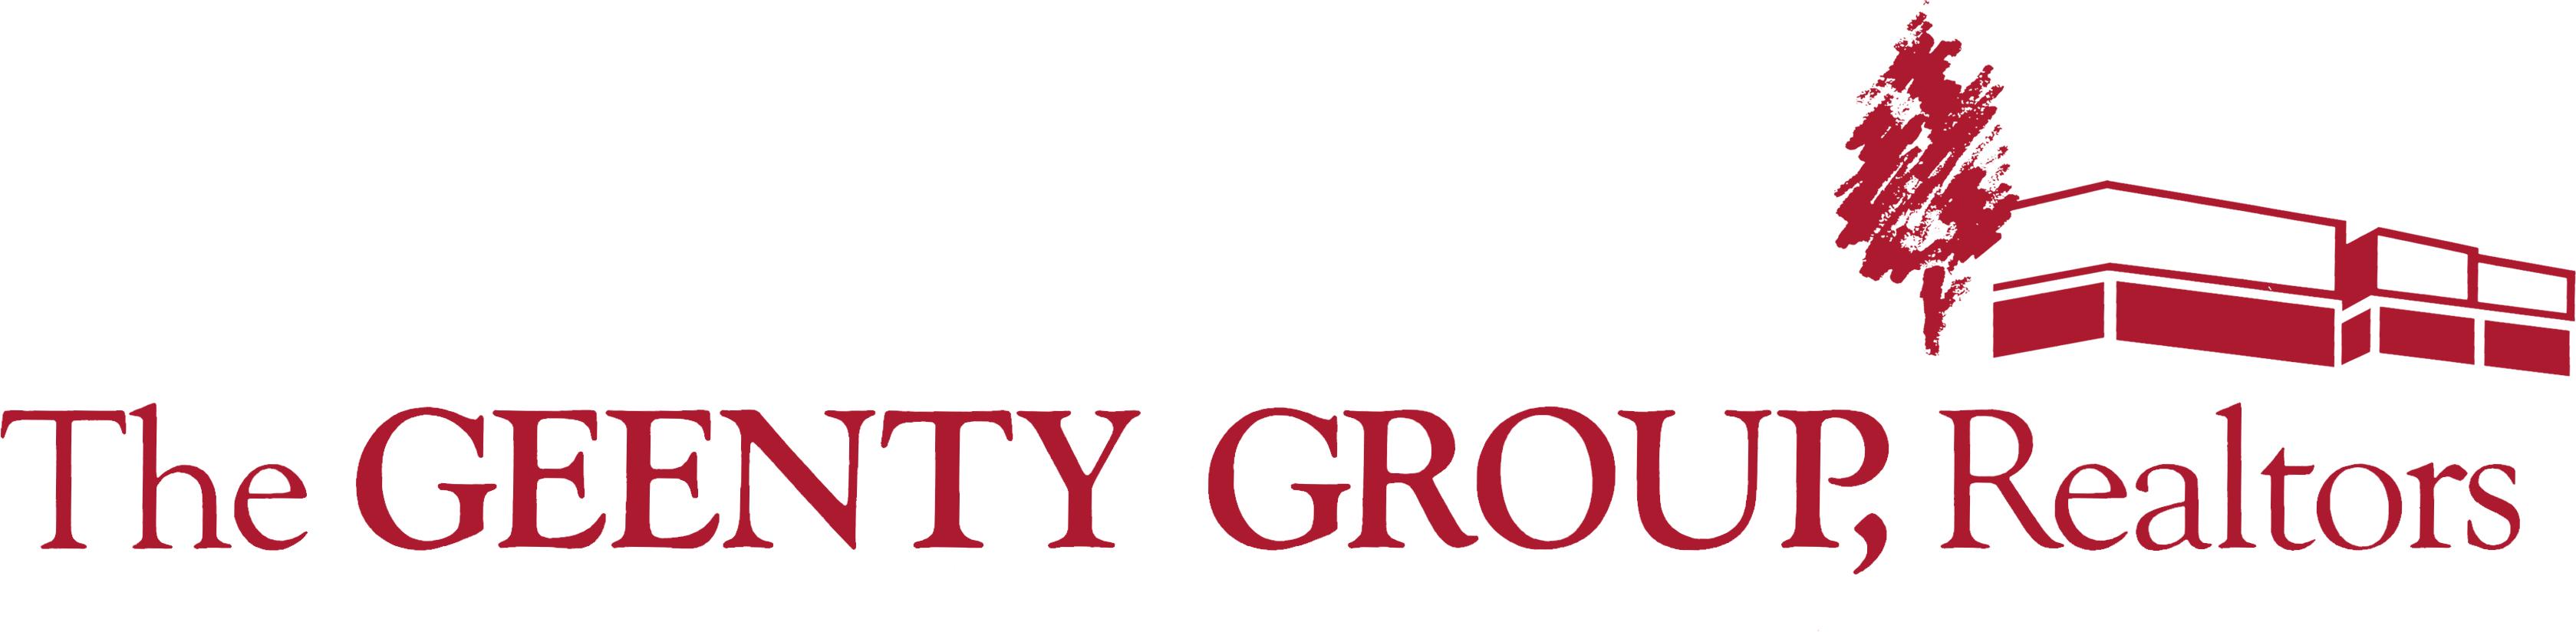 The Geenty Group, Realtors